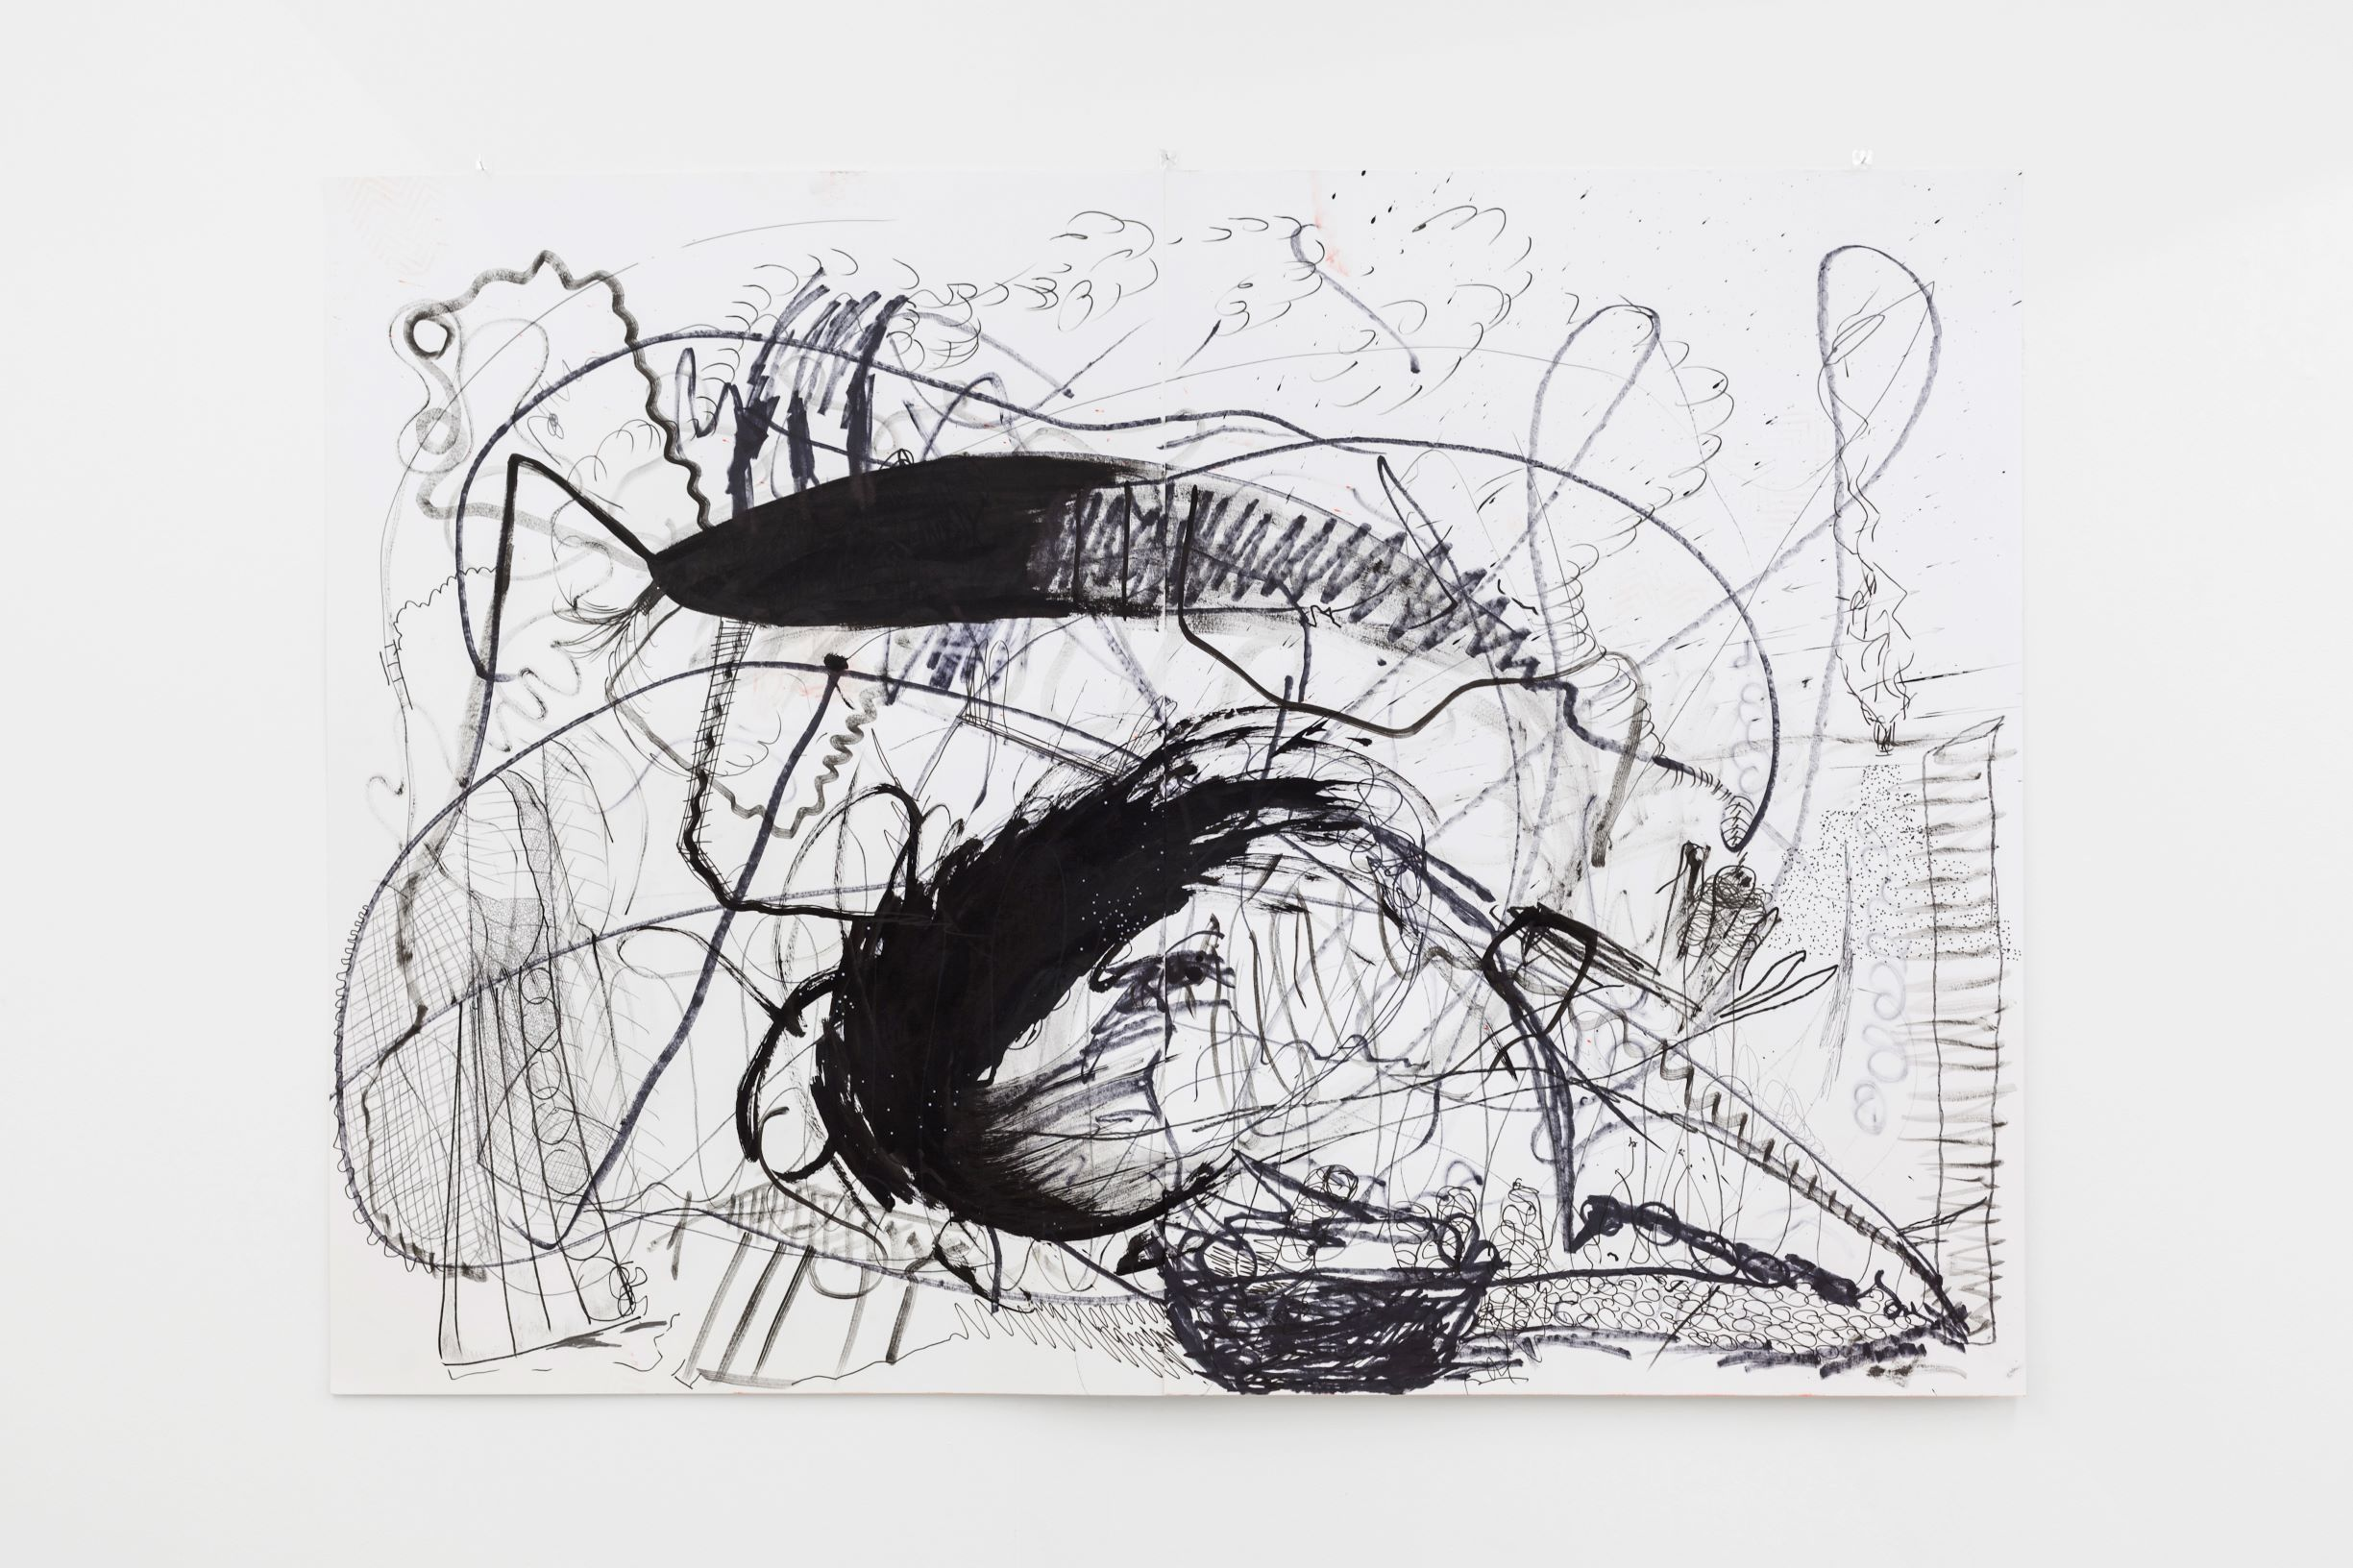 SCRIPTS, Linda Semadeni, Kirchgasse ©Björn Allemann, untitled, 2019, Ink, marker, pencil on paper, 100 x 140cm.